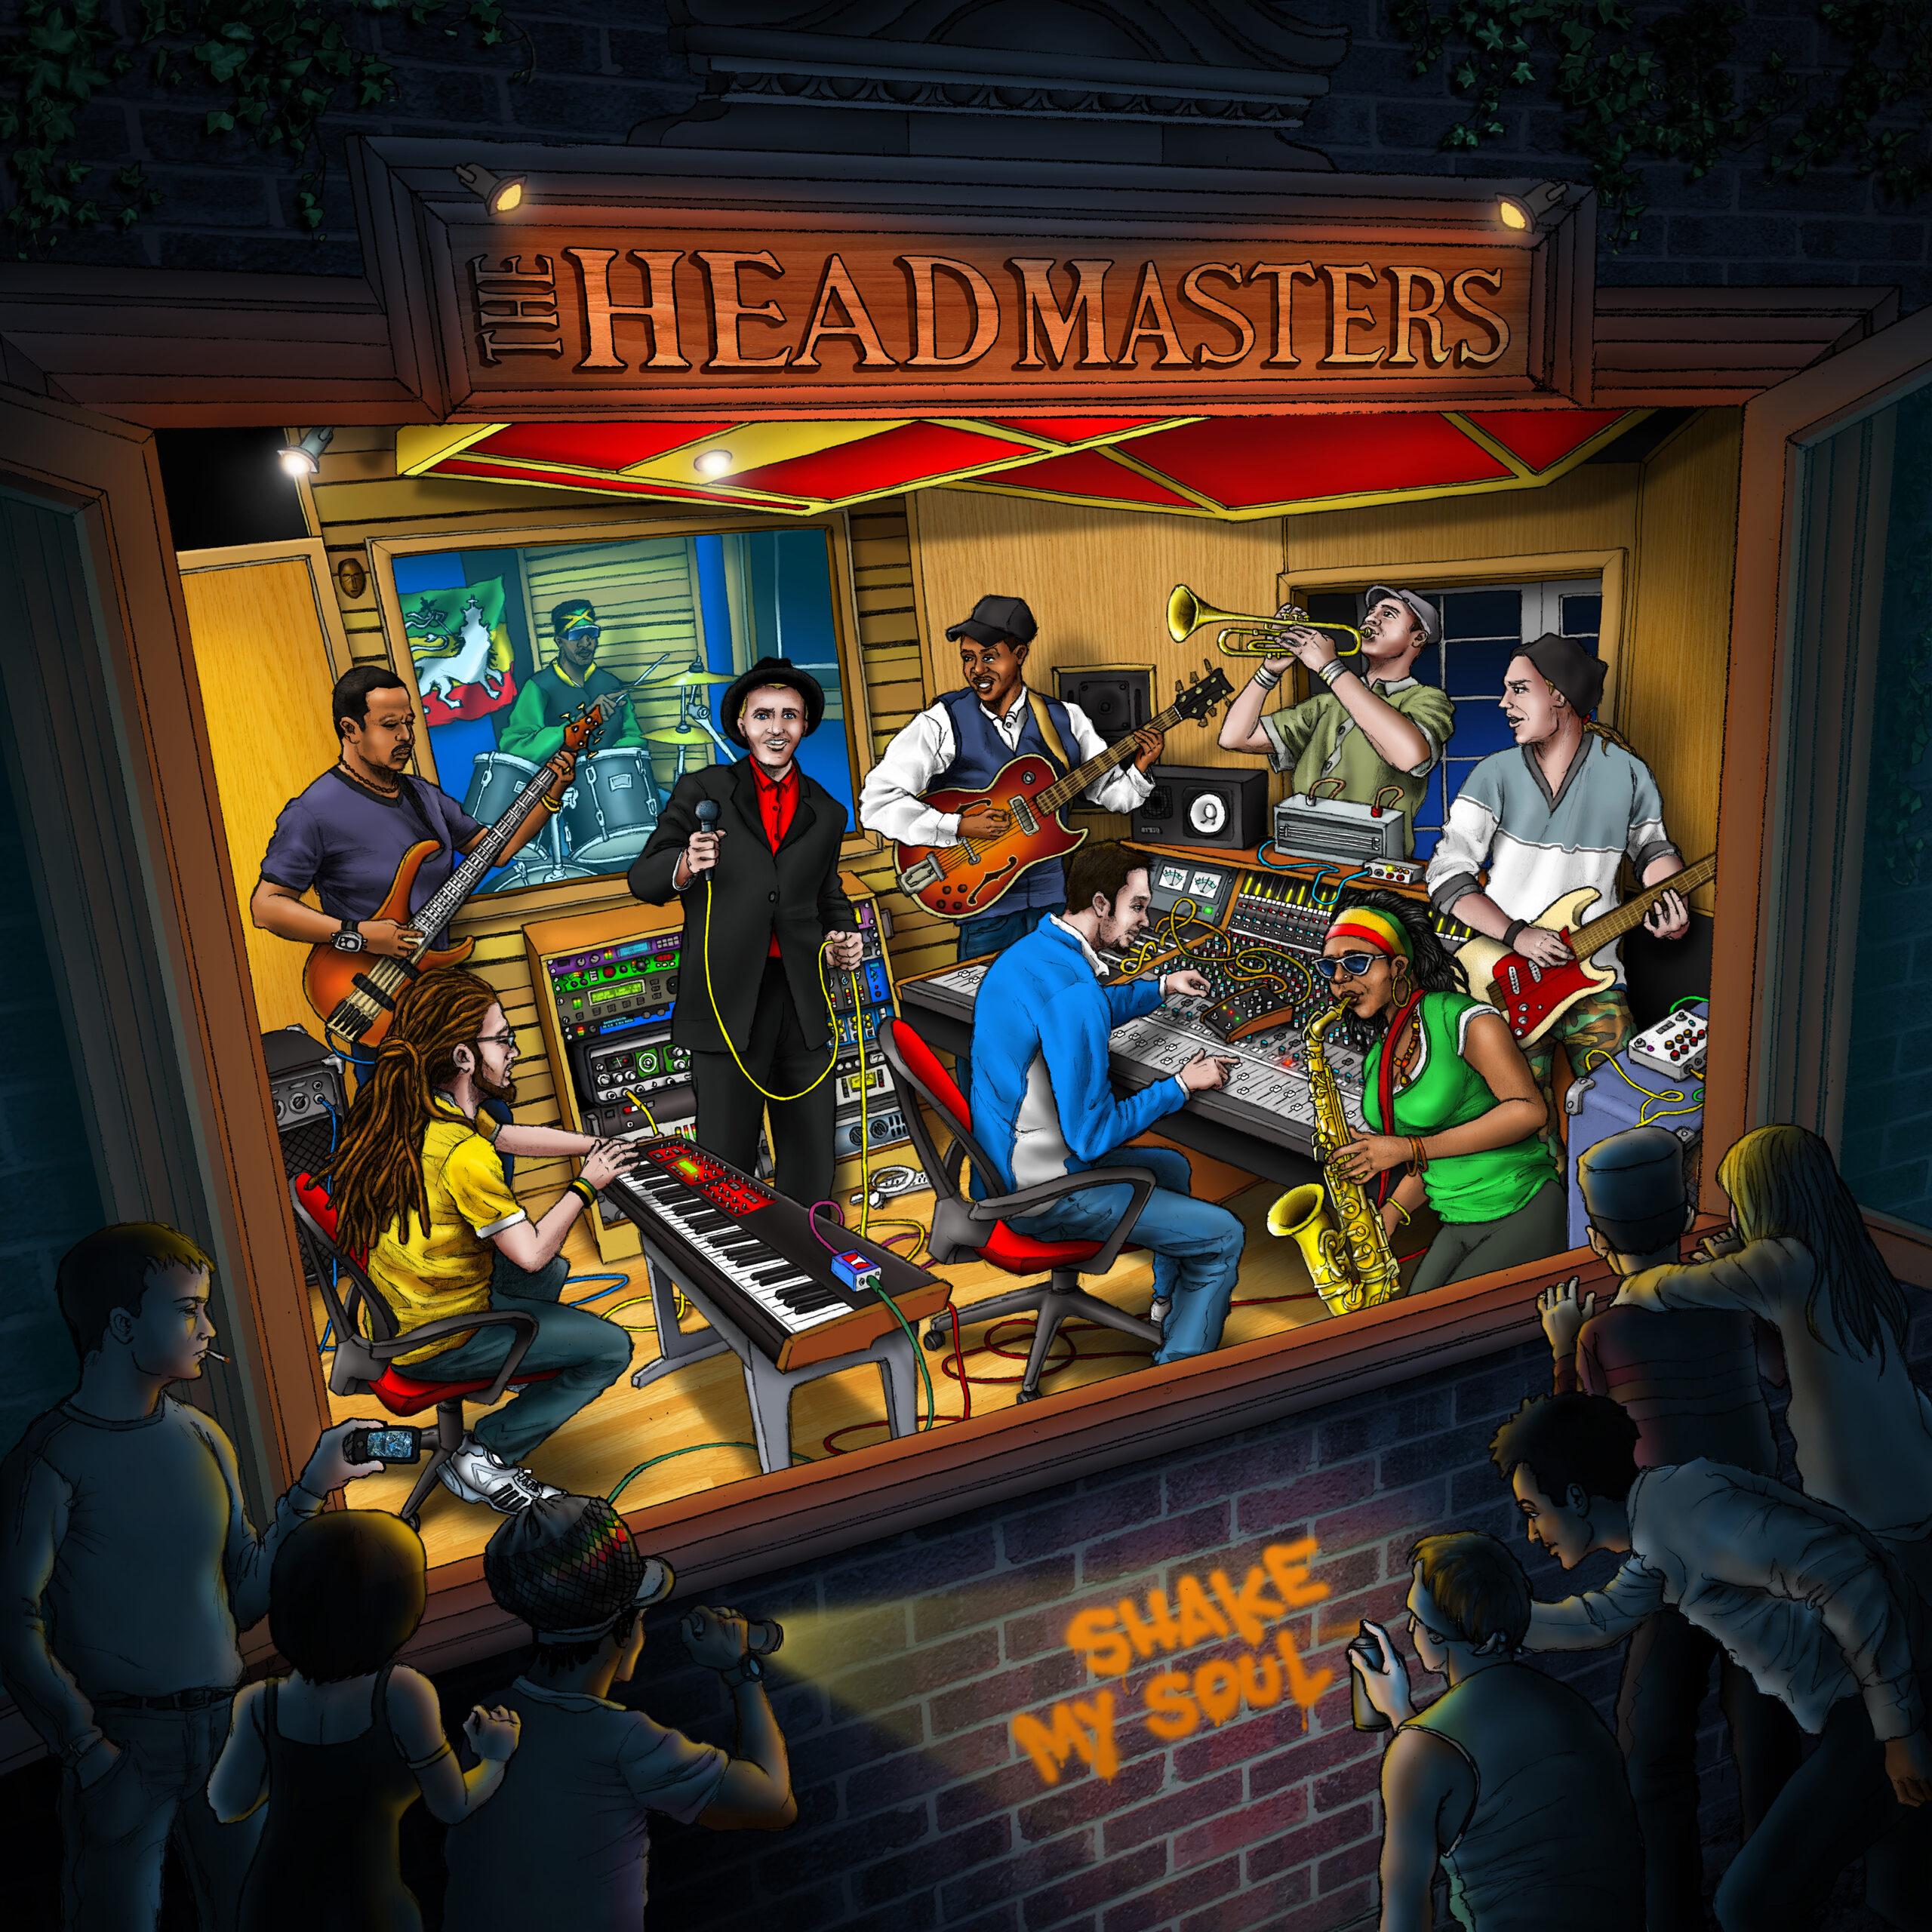 The-HeadMasters_Shake-My-Soul_Slipway-Records